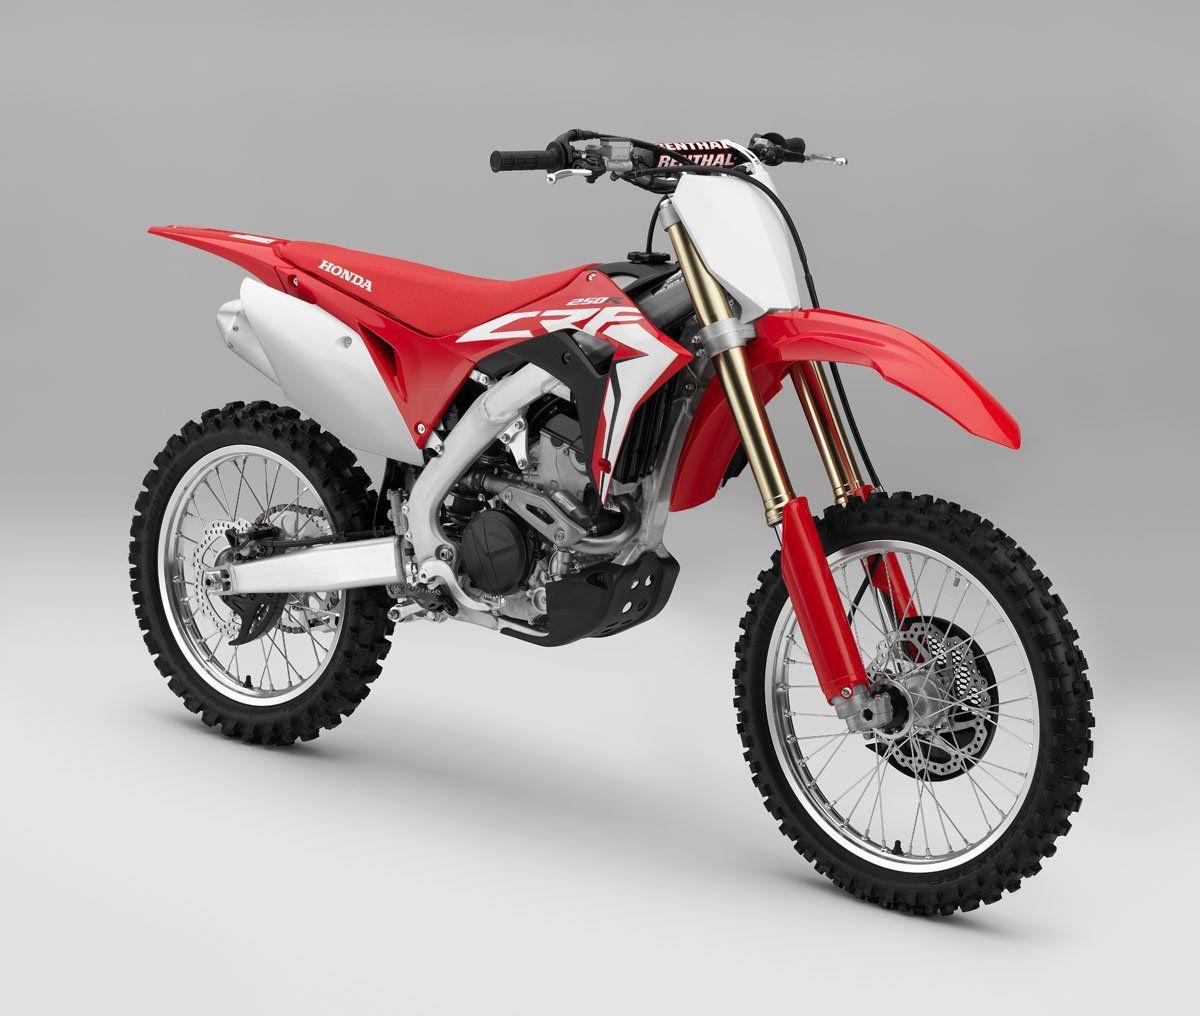 2018 Honda 85 Dirt Bike Ratings From Friday Wrap Up More On The 2018 Honda Crf250r Dirt Bike Magazine Pertaining To 2018 Vintage Motocross 2013 Honda Honda